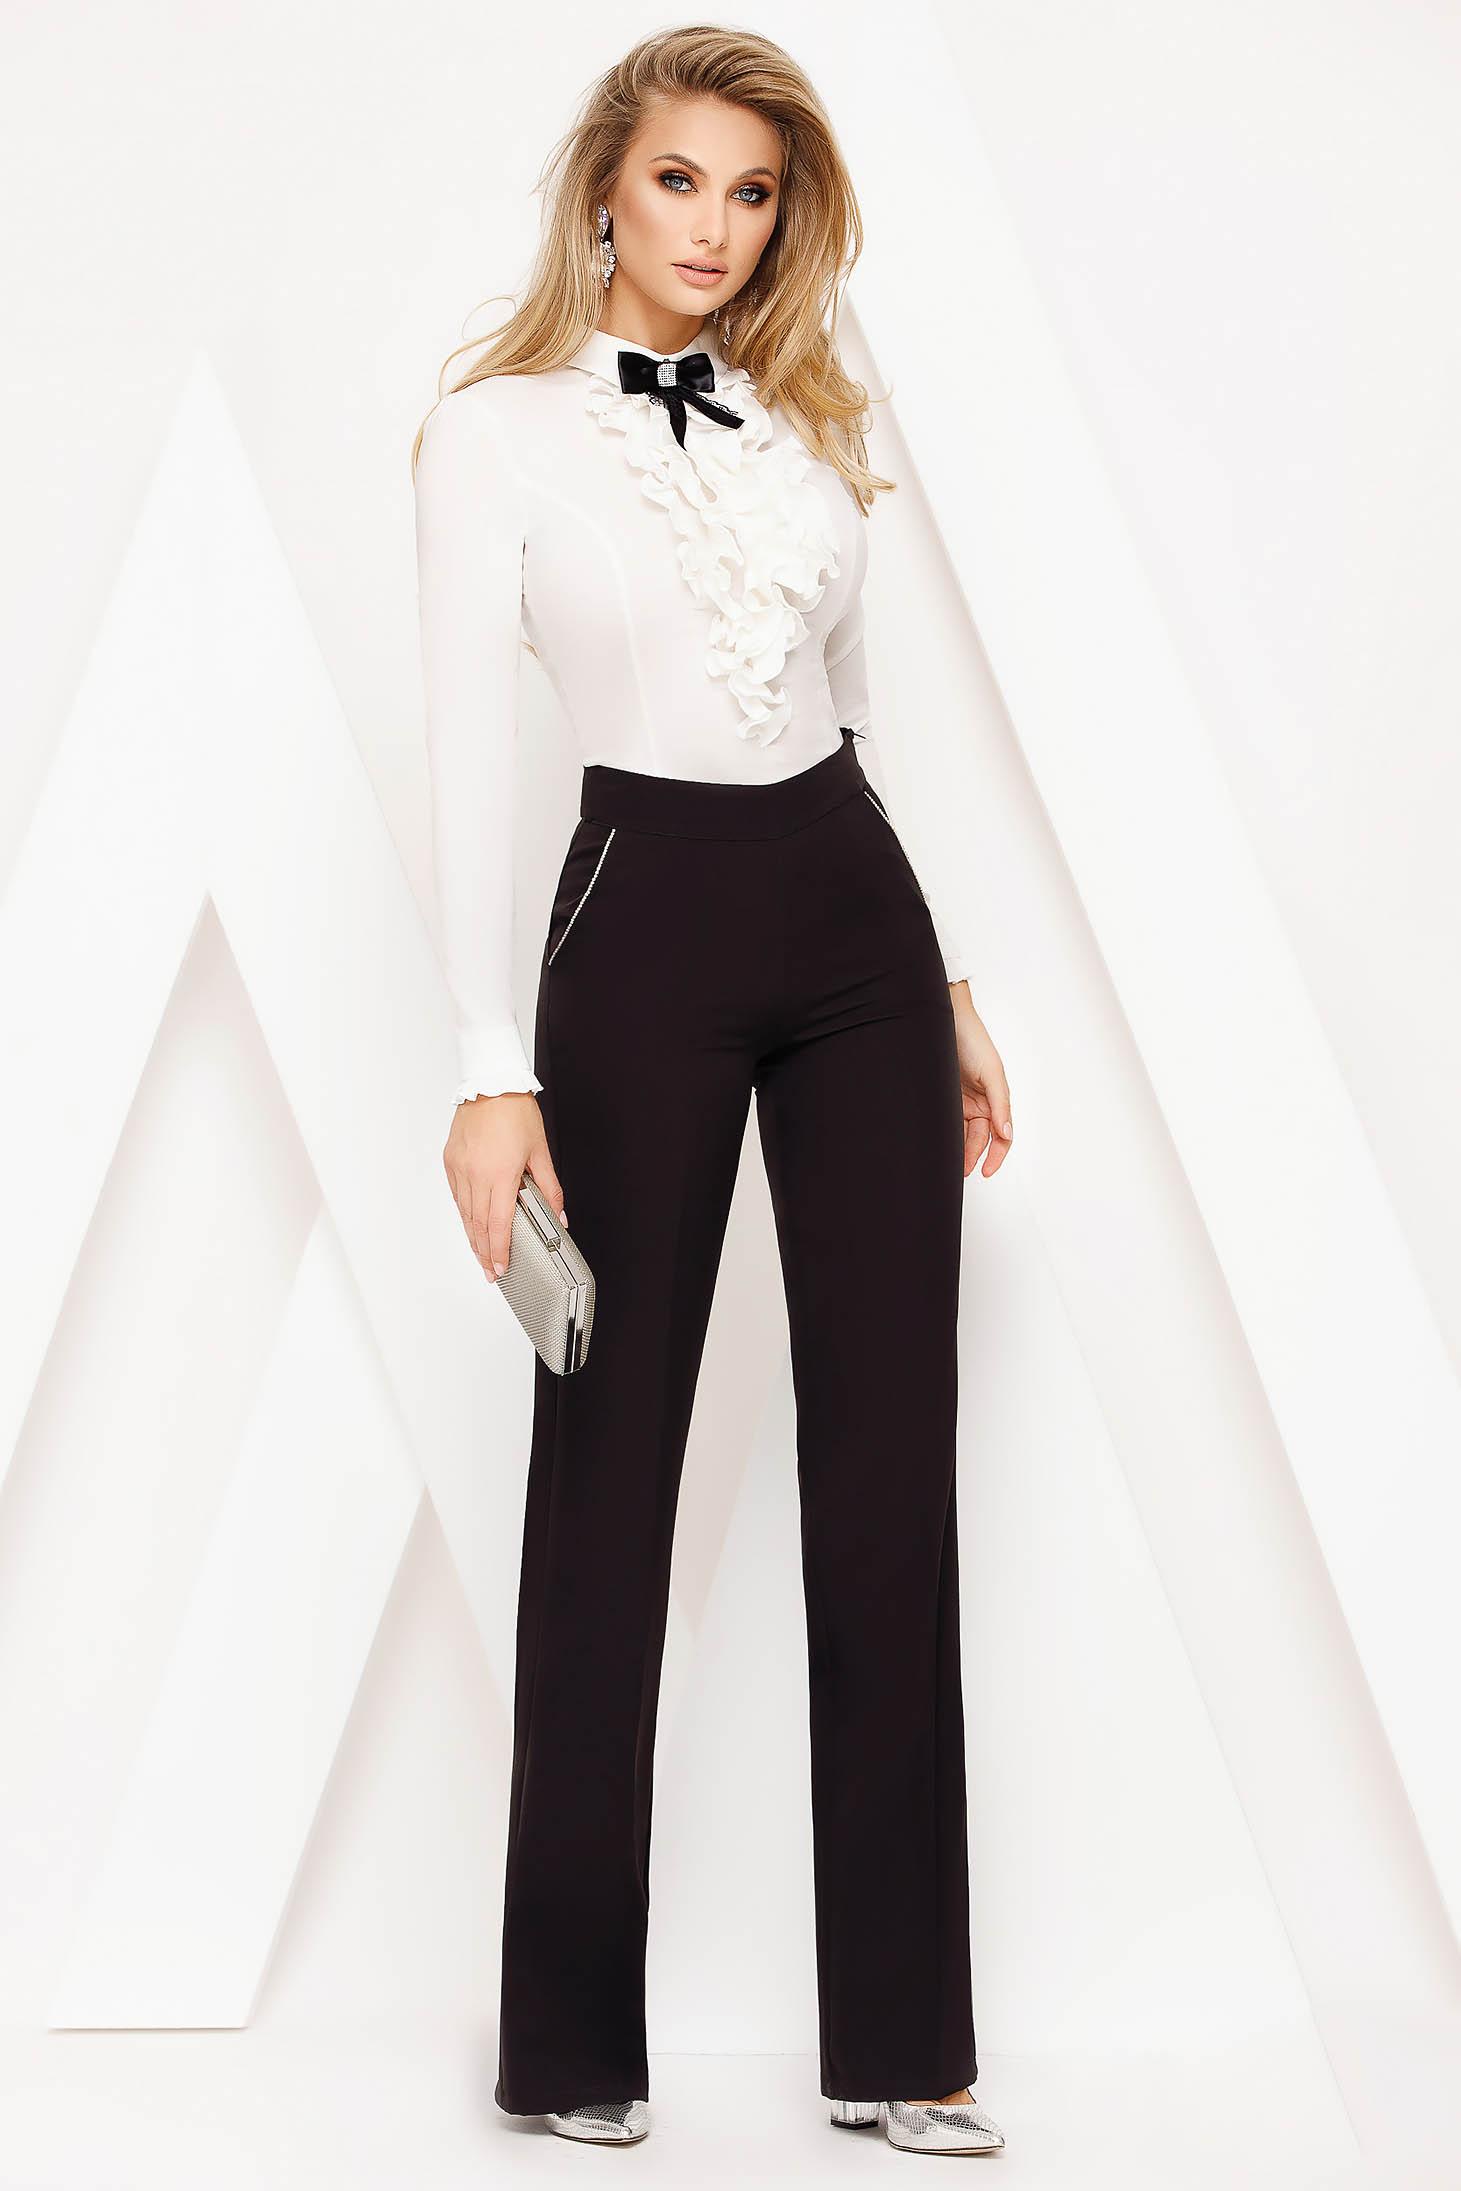 Black trousers elegant high waisted flared cloth